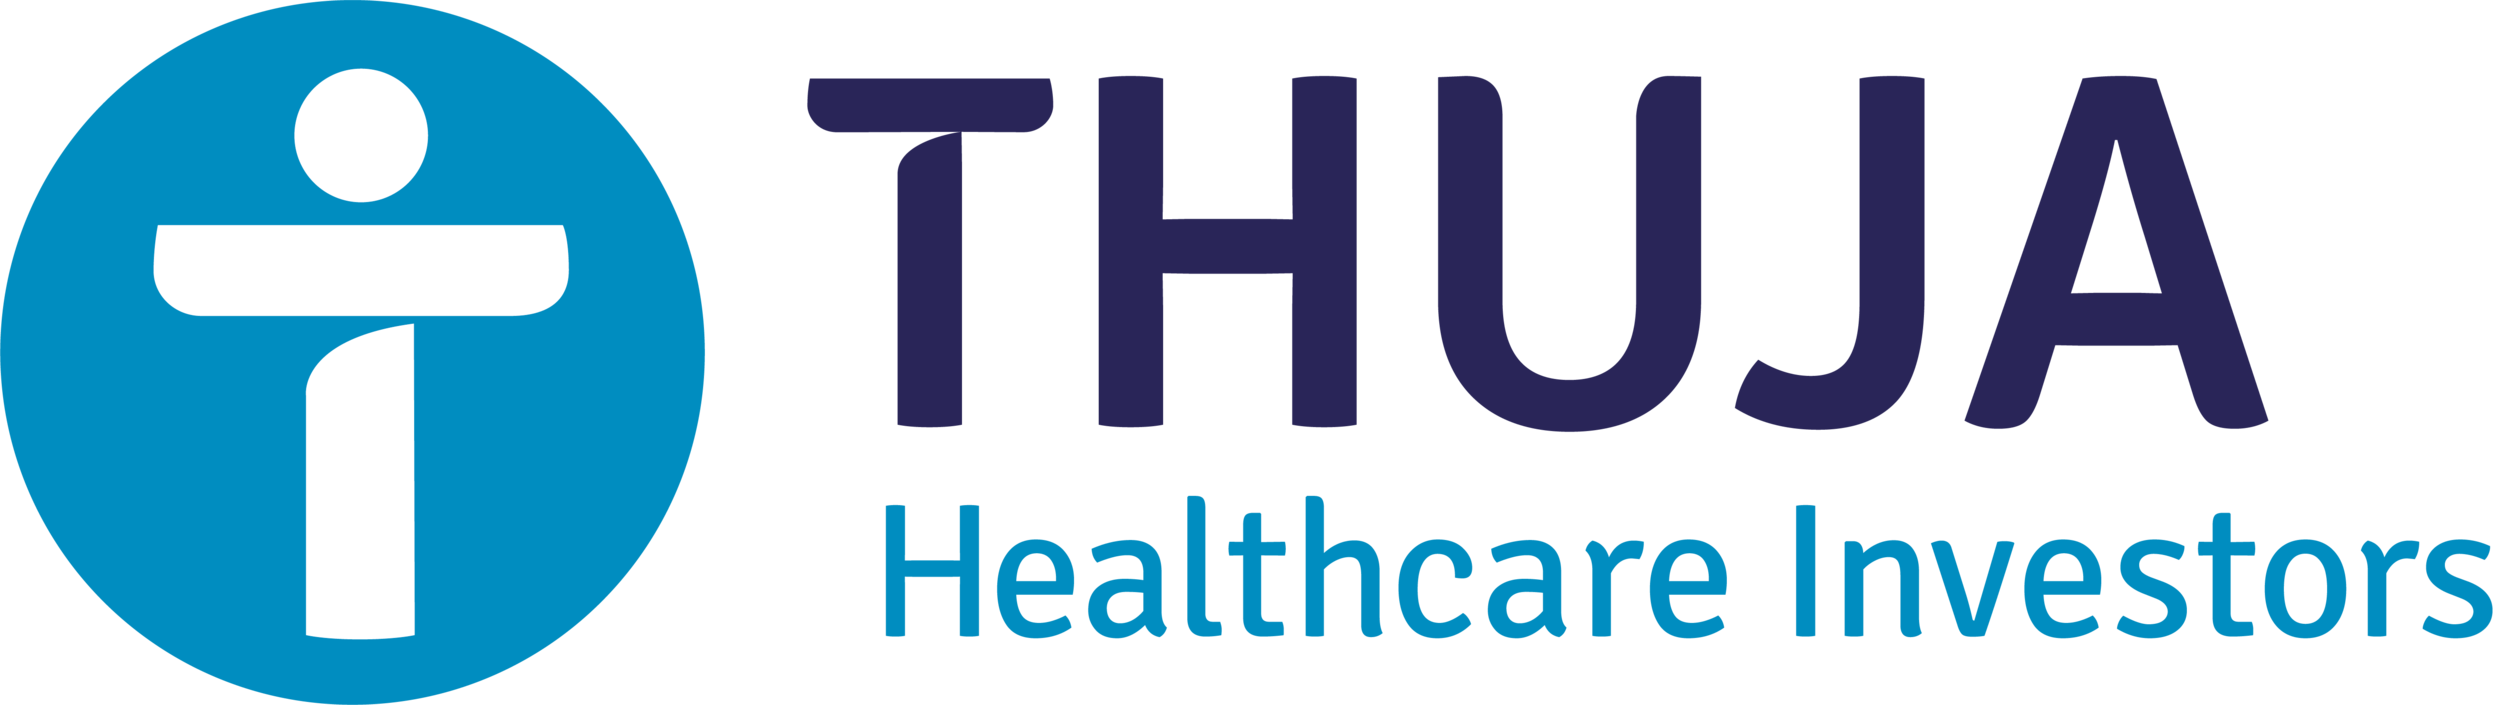 Thuja Healthcare Investors logo.png